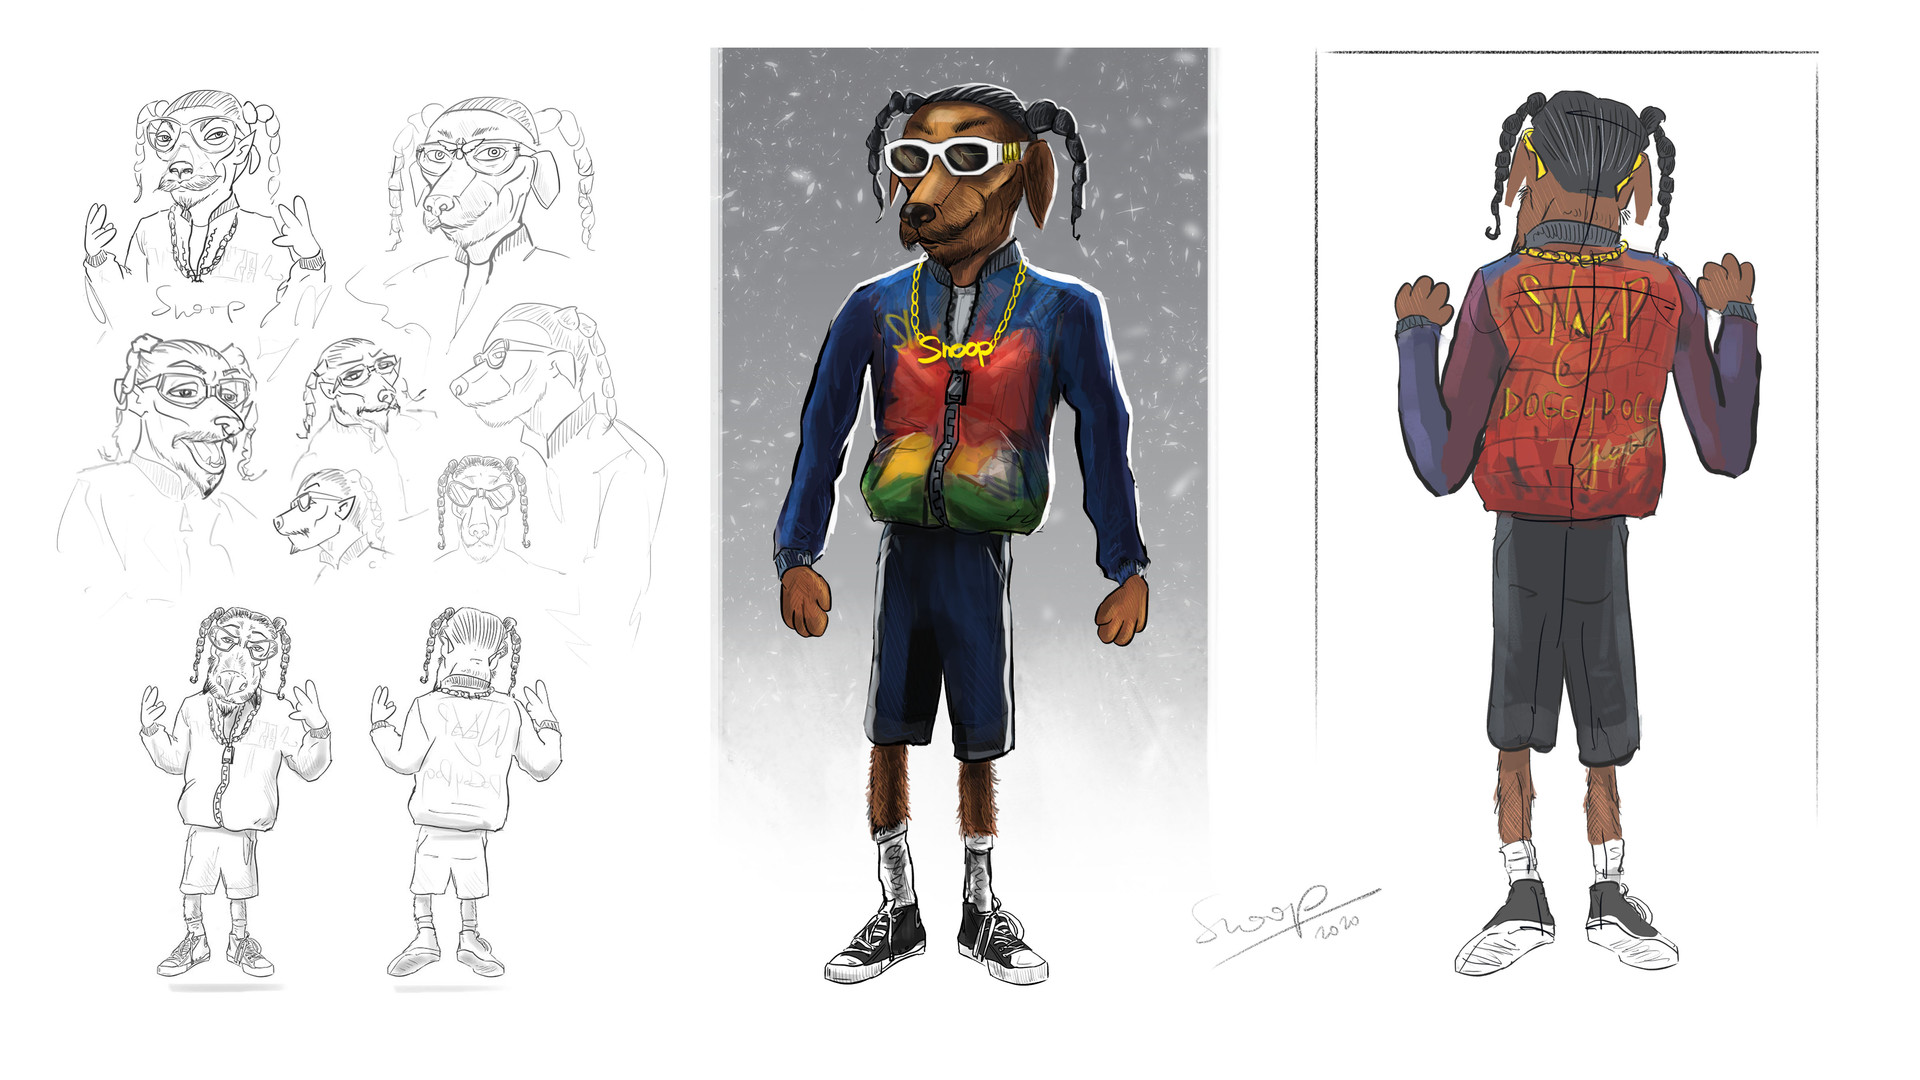 Puppet design for Snoop Dogg x Just Eat 'Doggy Dogg Christmas' | dir. Chloe Hughes & Emil Nava | OB Management / Ammolite / McCann London